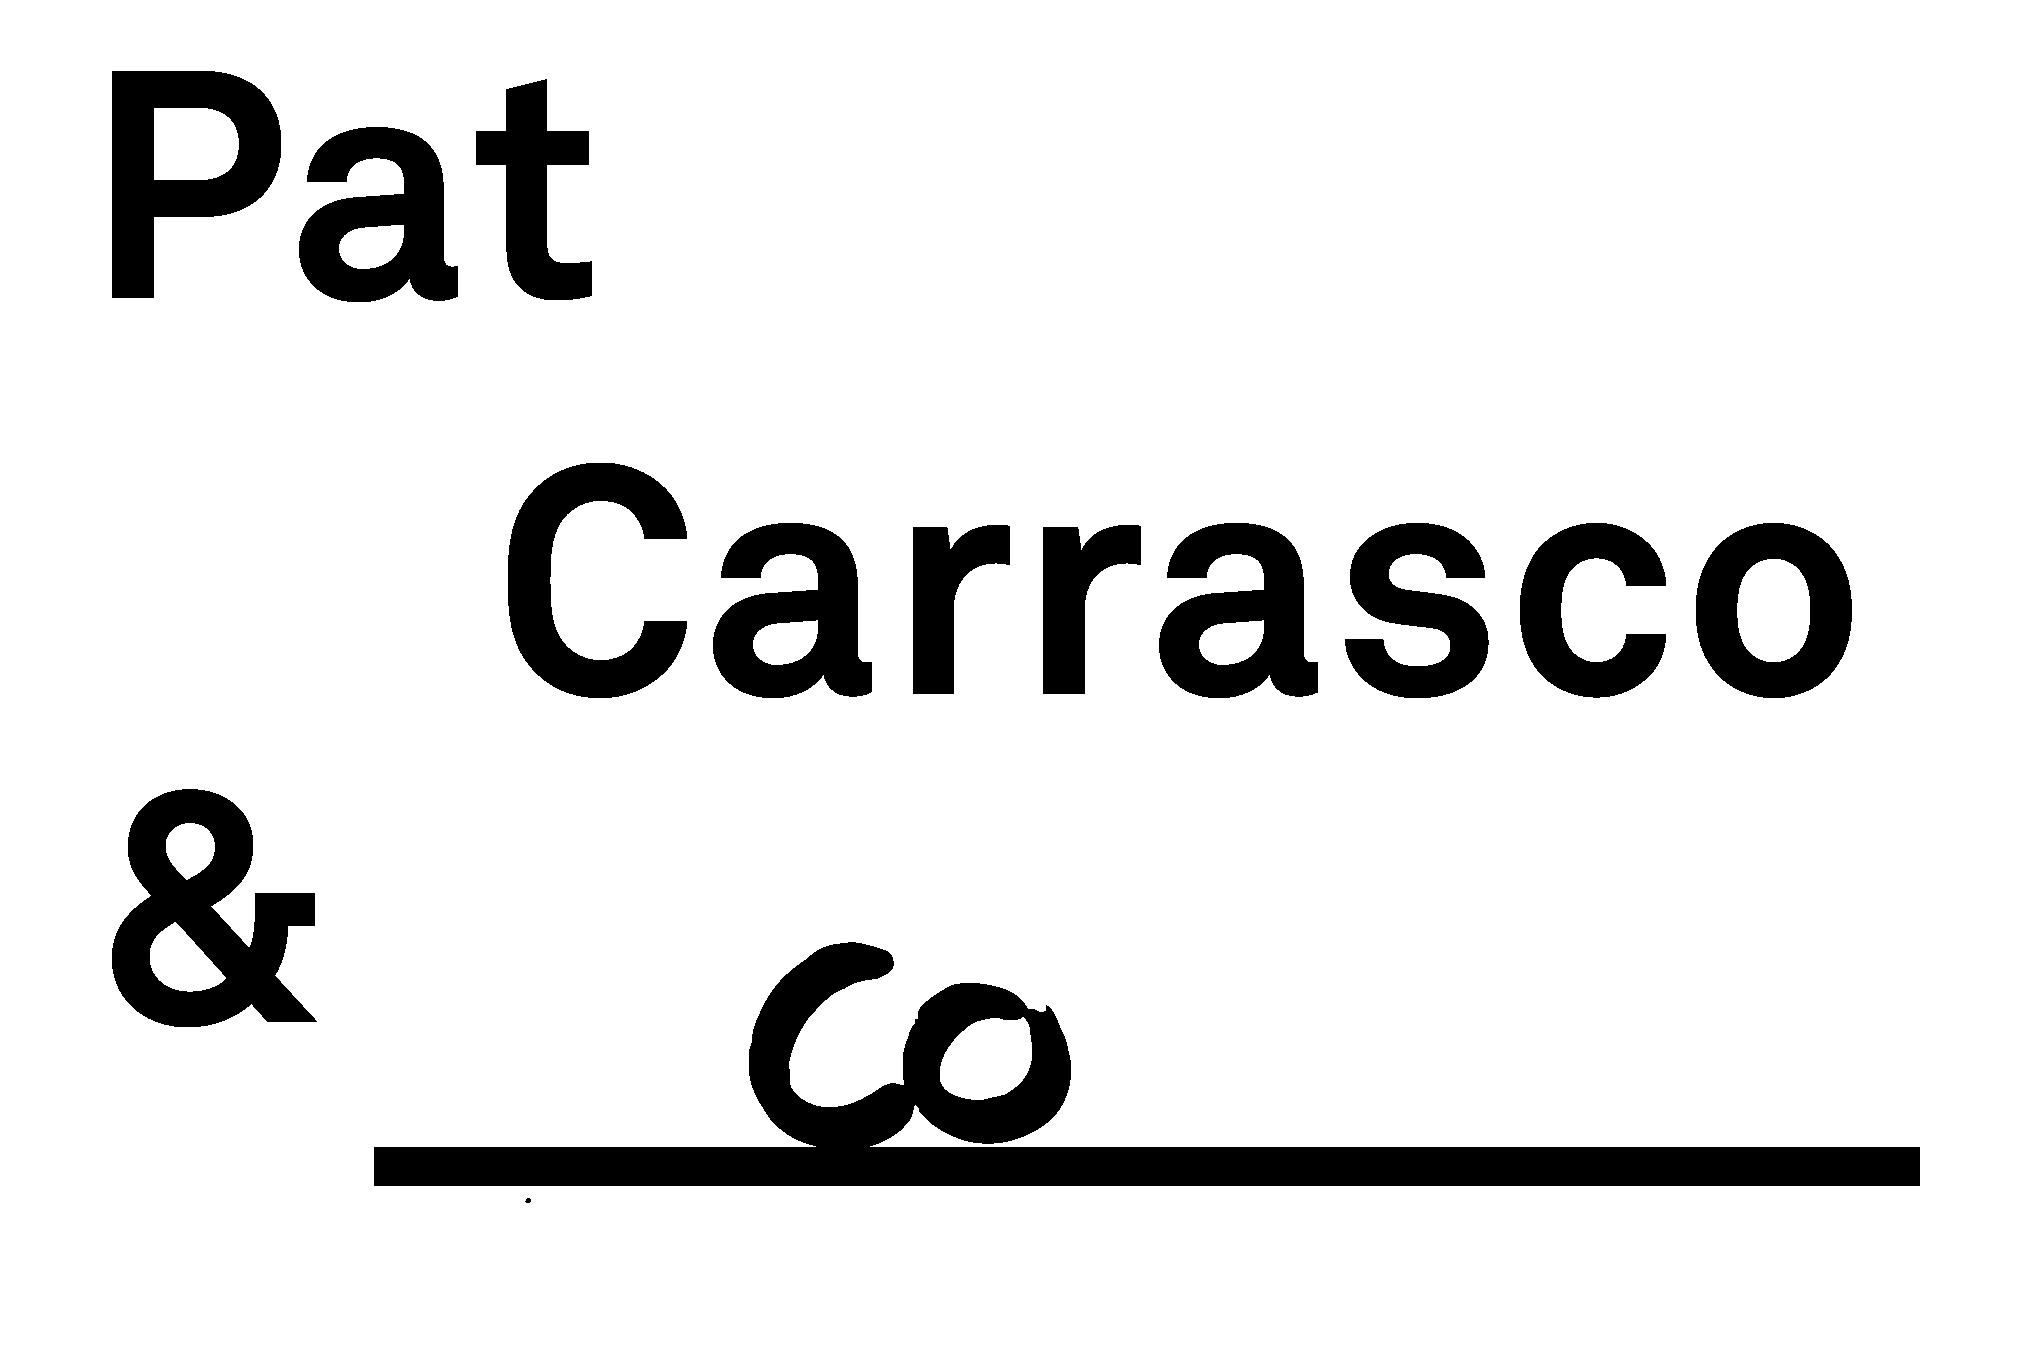 AF-logo-patcarrasco-03